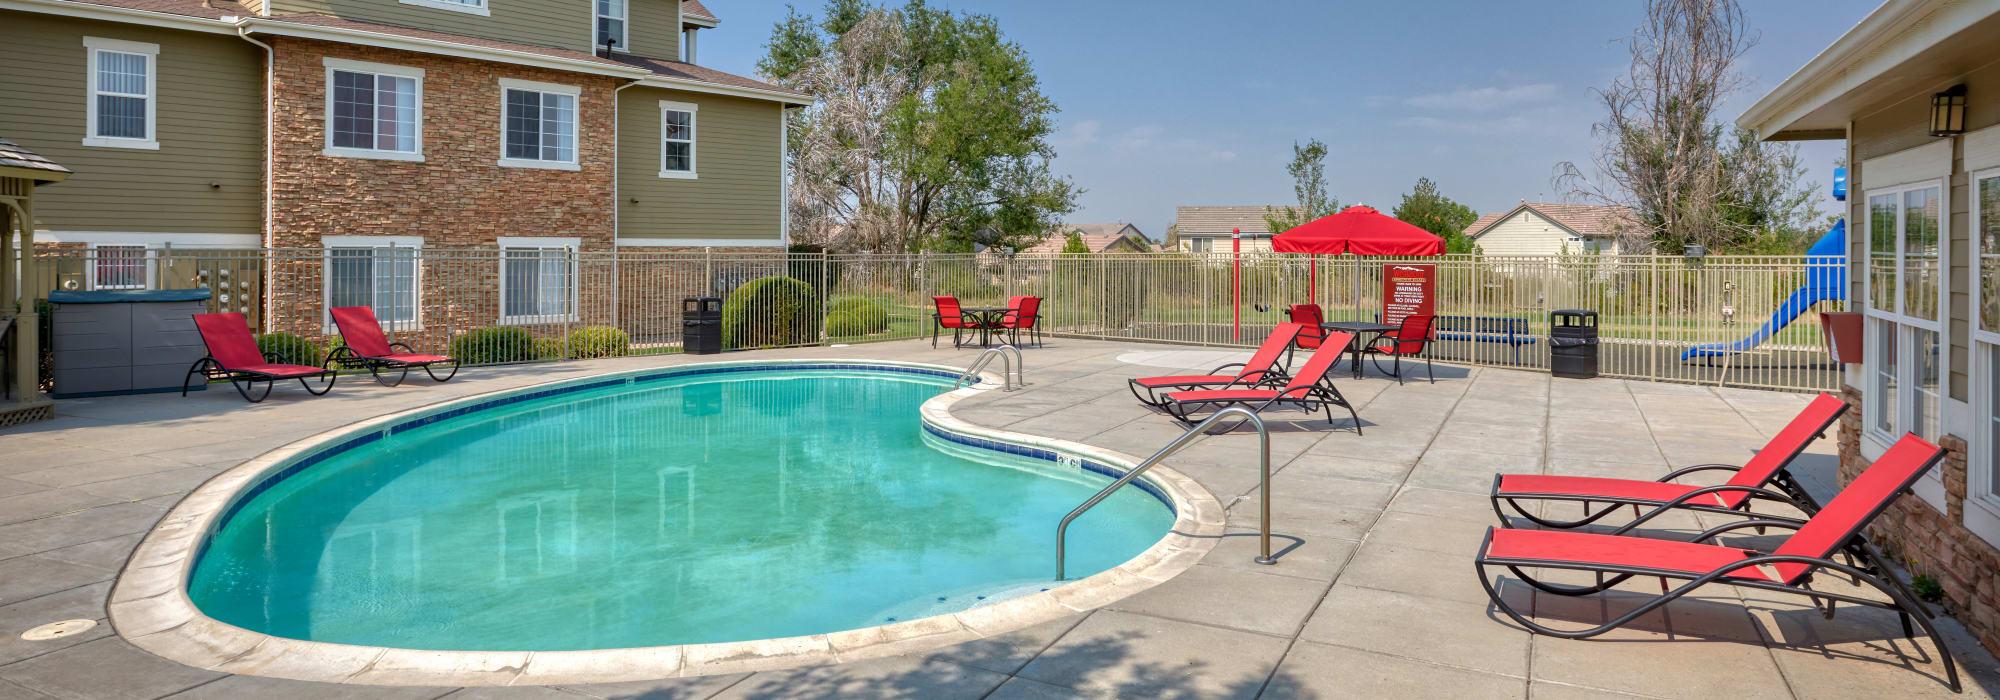 Apply to Westridge Apartments in Aurora, Colorado